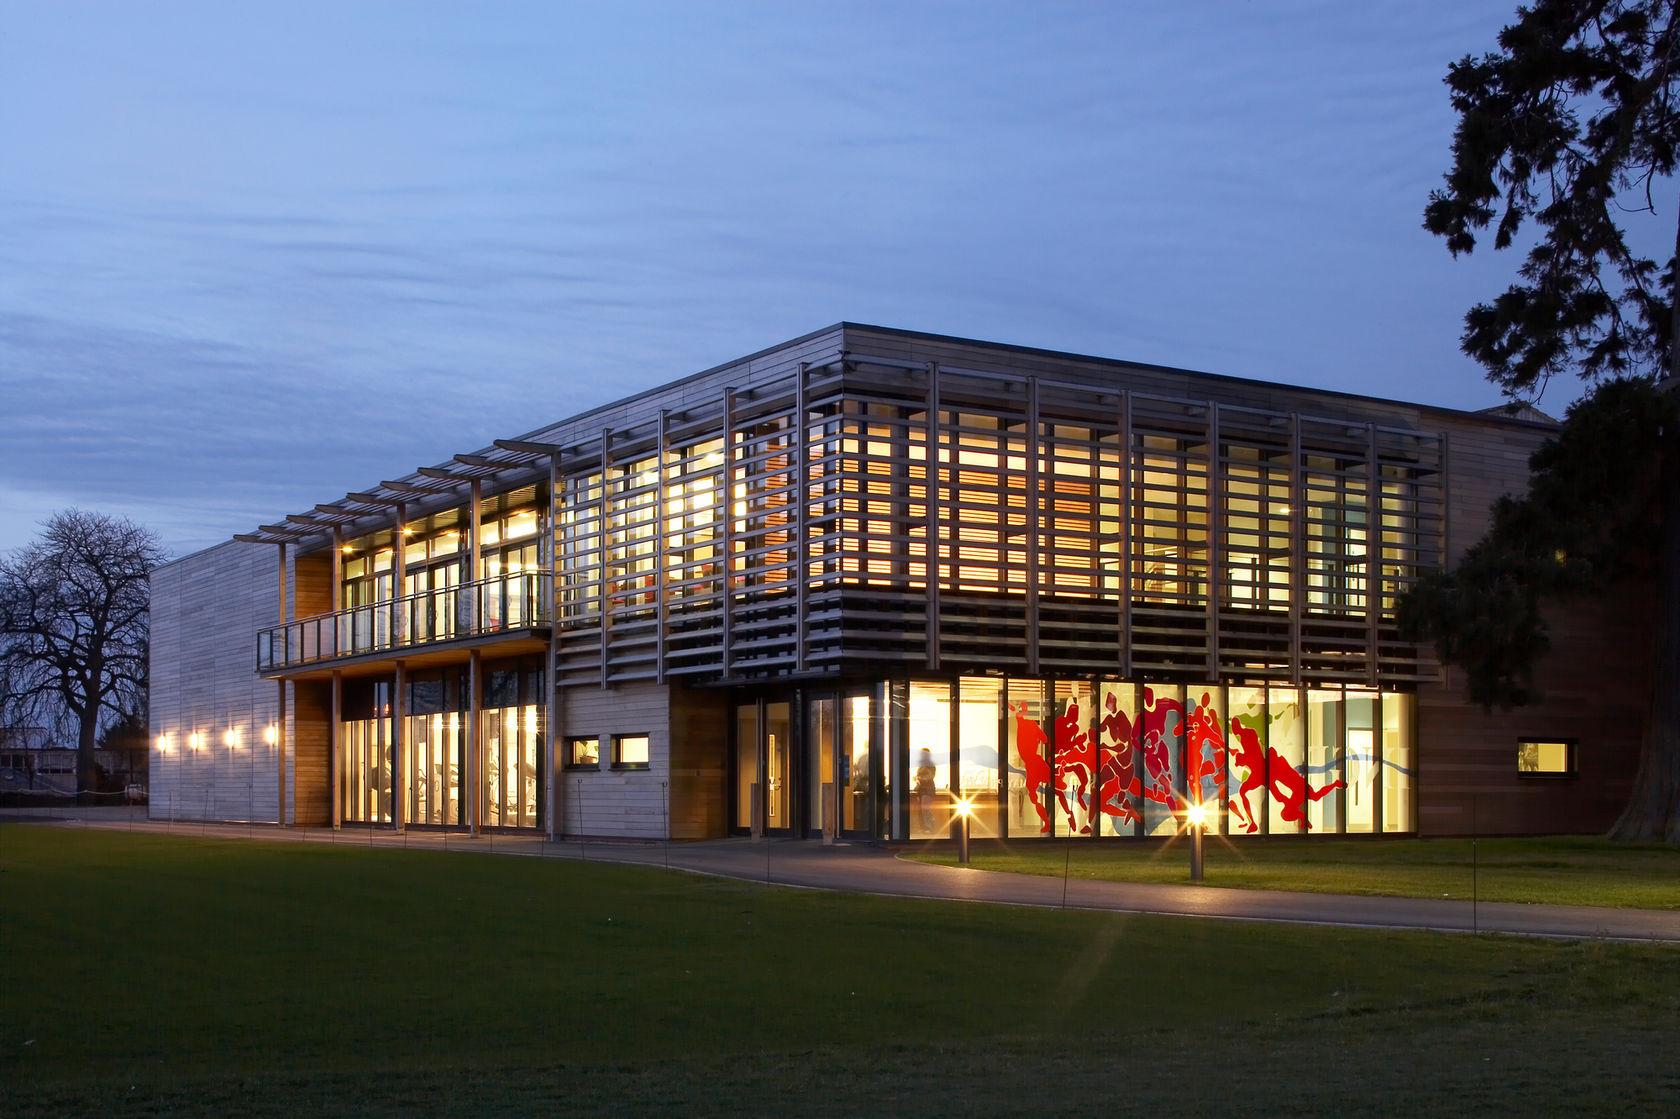 5184 Abingdon School Sports Centre N4 wlandscape